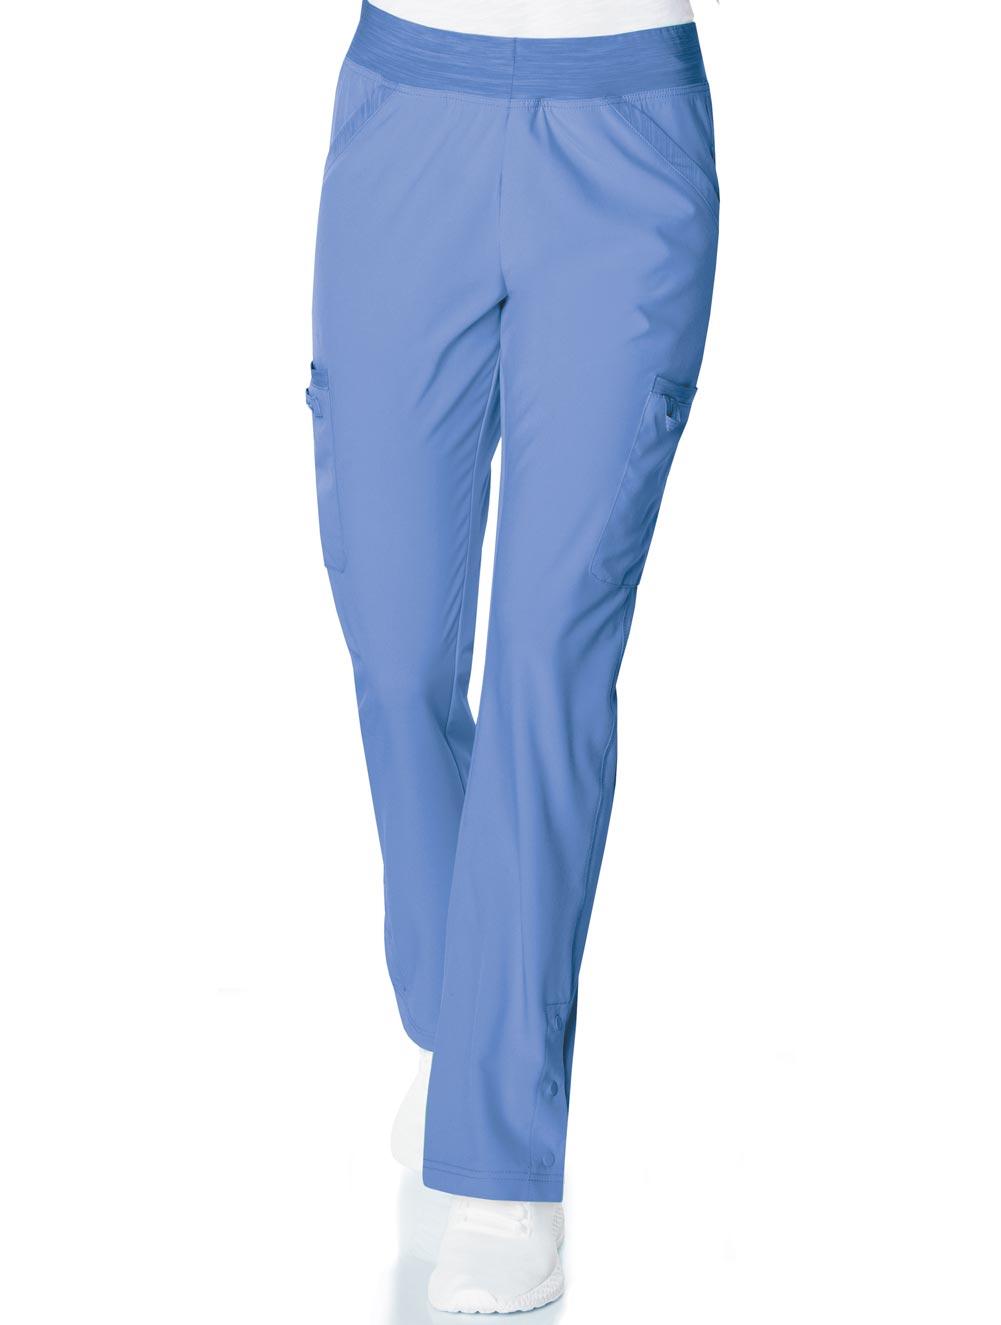 Women's Modern Fit Yoga Pant